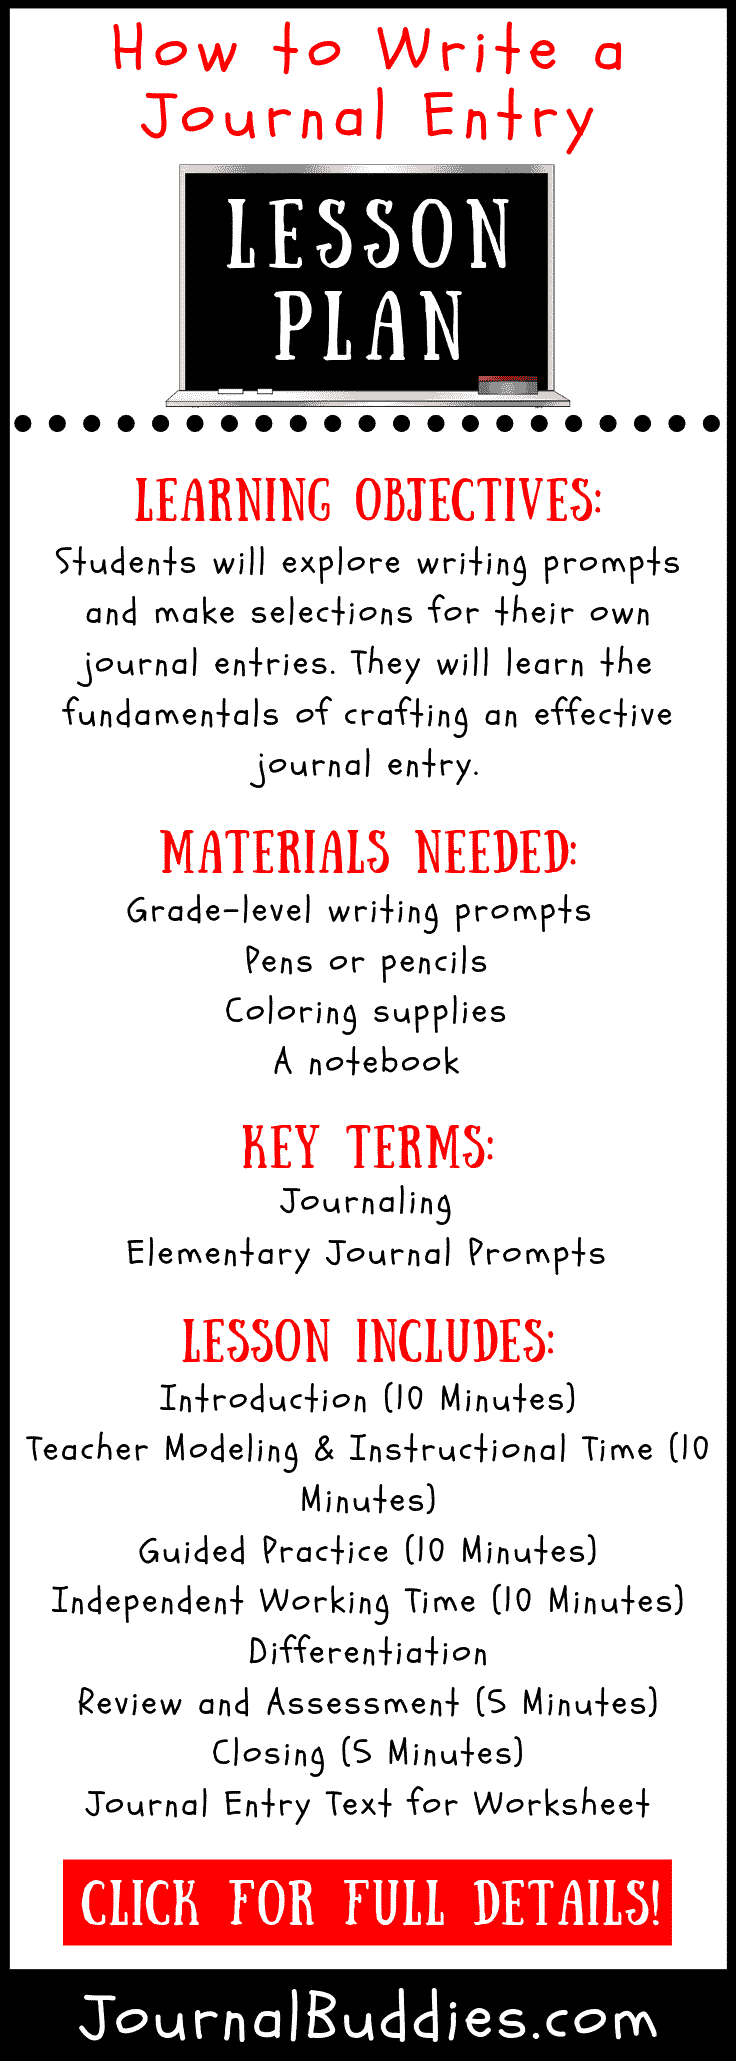 Journal Entry Writing Lesson Plan for Teachers